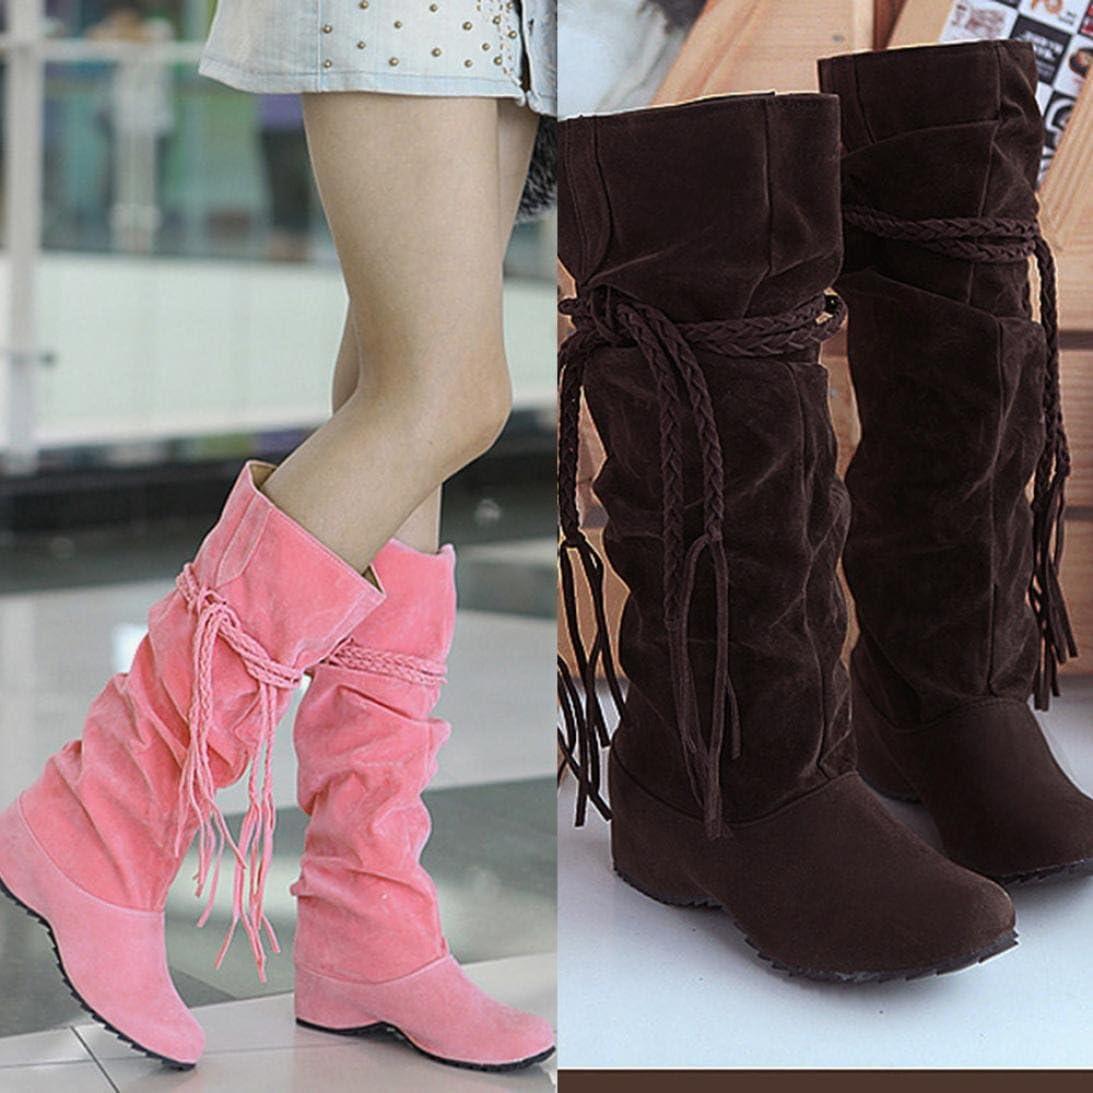 Damen Lang Stiefel OVERMAL Stretch Slim Stiefel High Stiefel Quaste Stiefel High Heels Stiefel